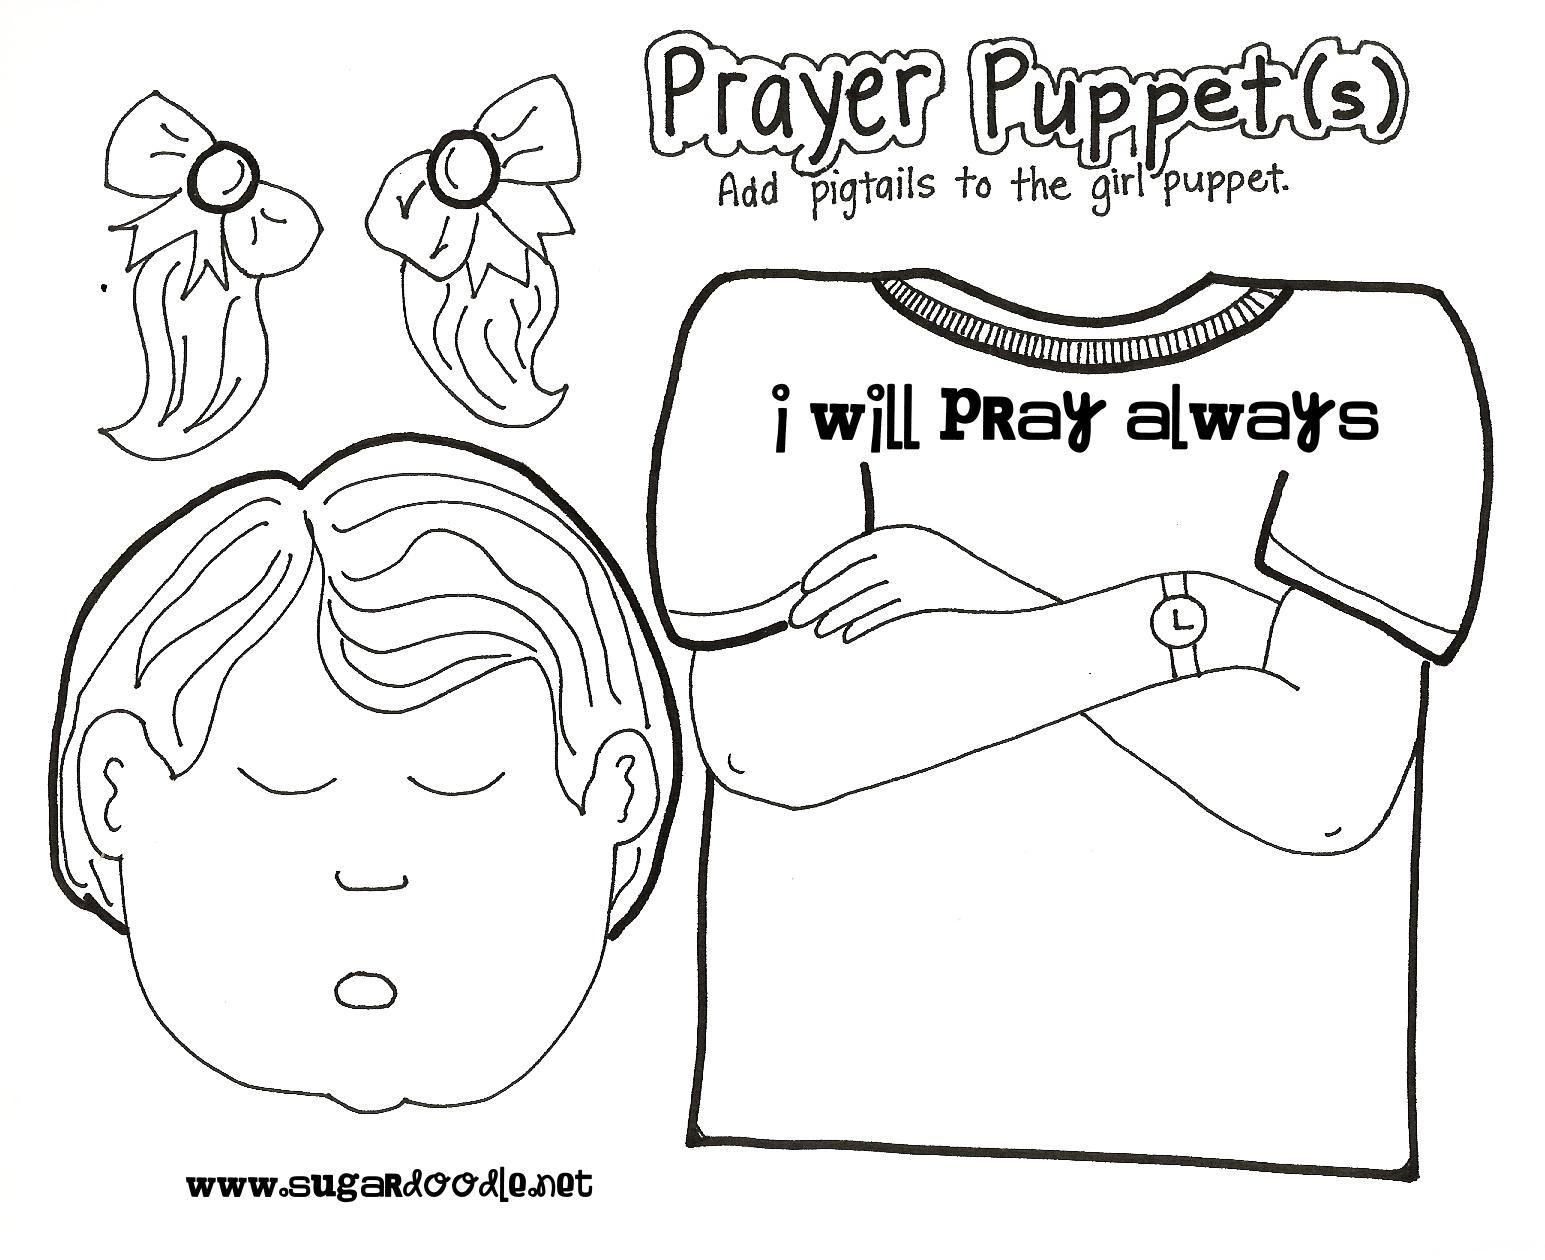 News with Naylors: Prayer (2): Prayer Puppets, Prayer